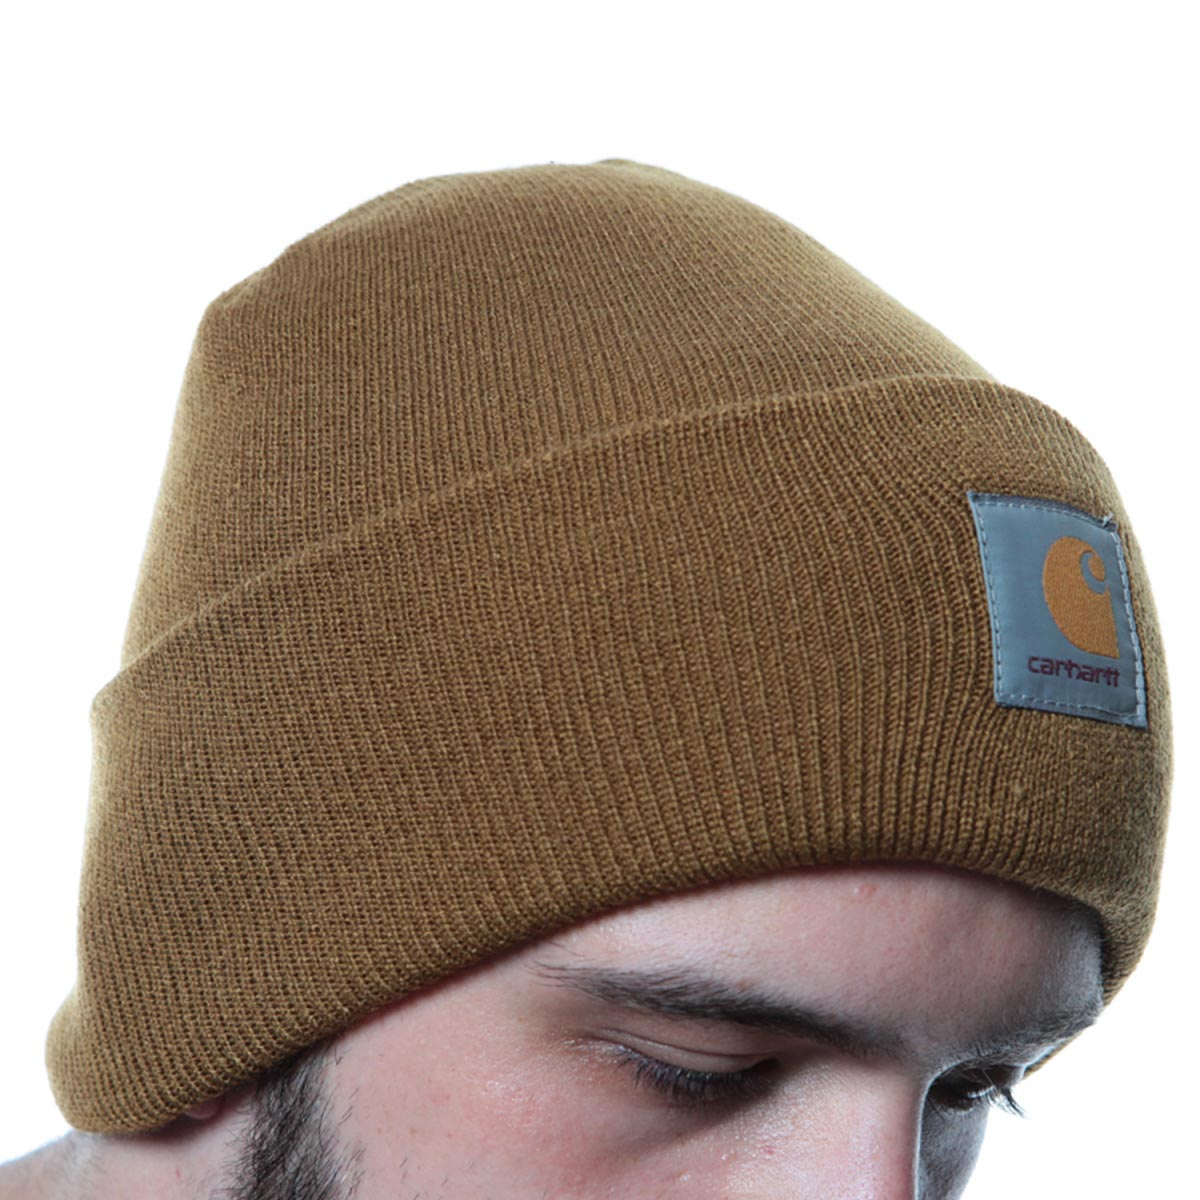 a5a874a03477c Vendita online Acrylic Watch Hat - Hamilton Brown - Carhartt ...